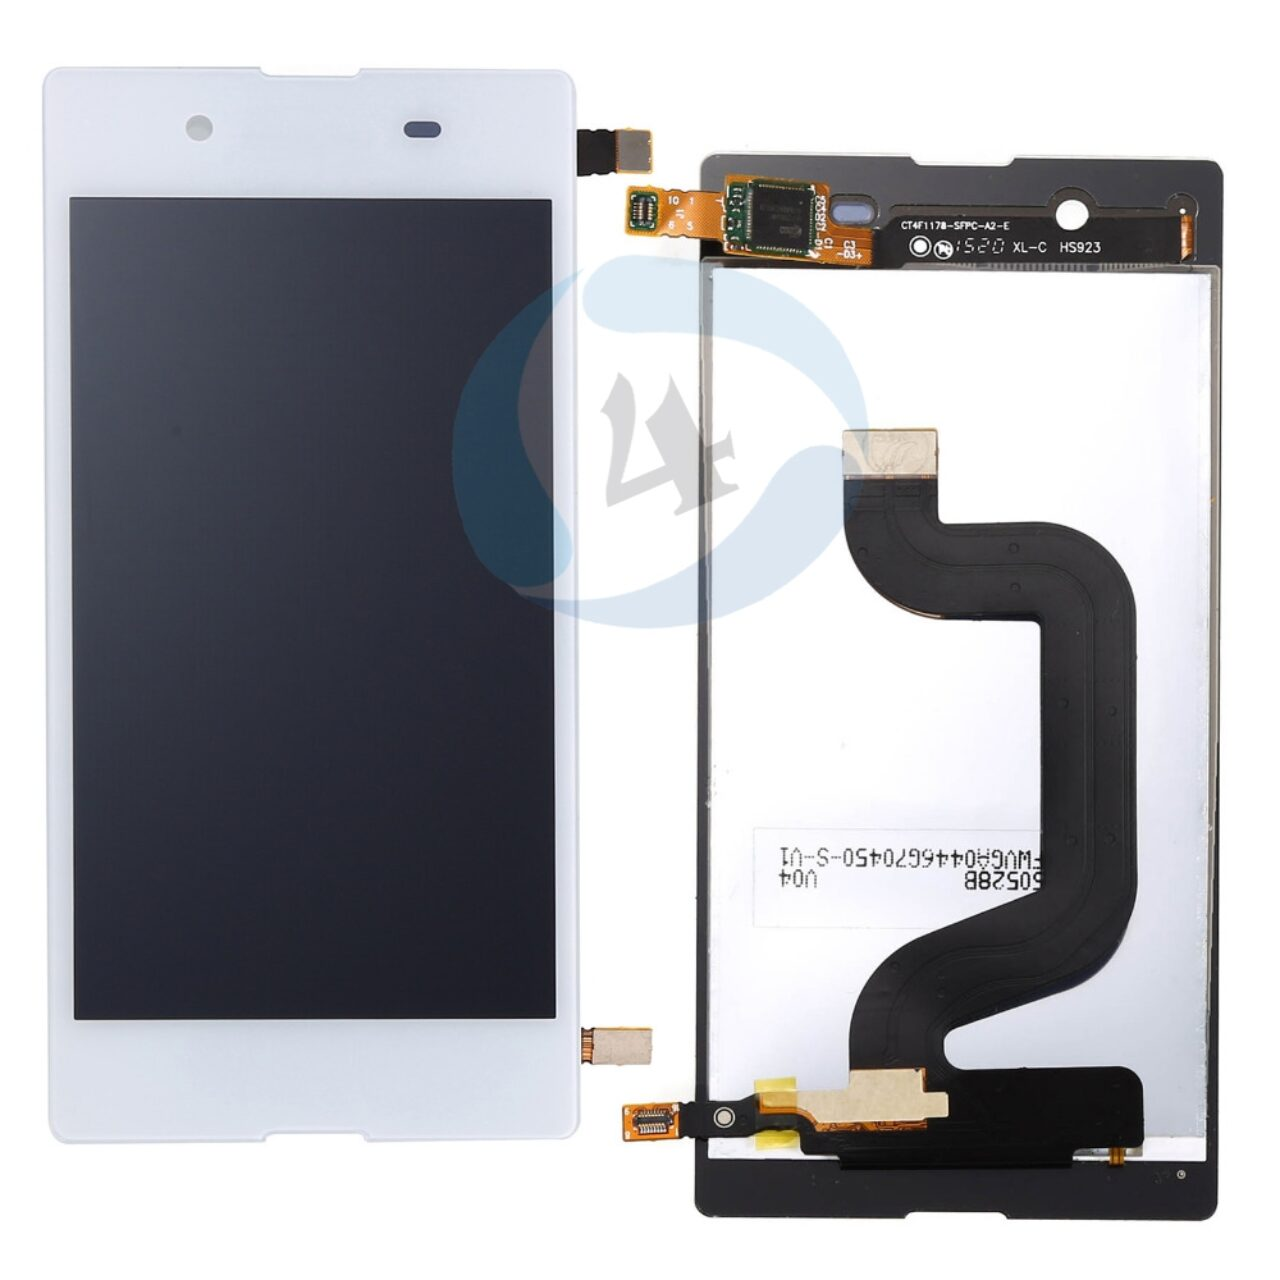 Xiaomi Mi Note 10 Lite SIM Tray Black 01 42965 1614070963